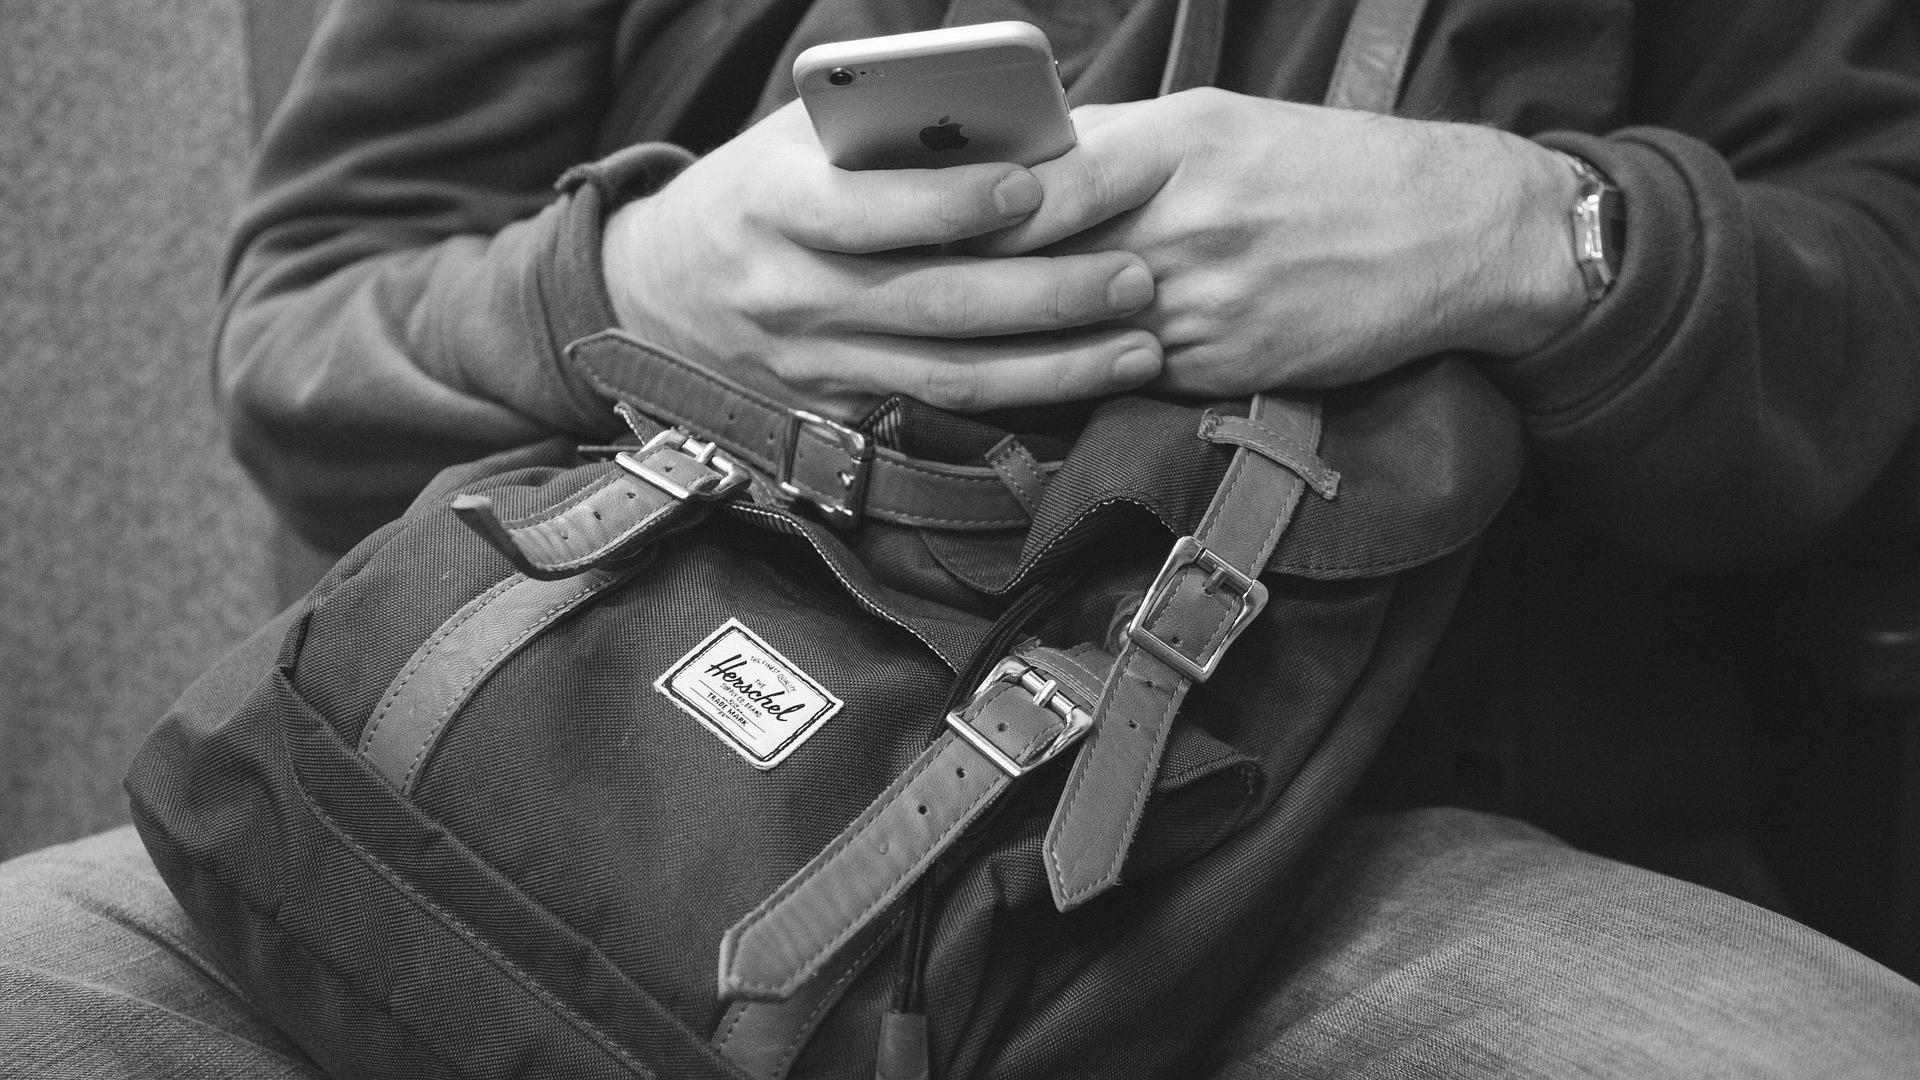 backpack-1149544_1920.jpg